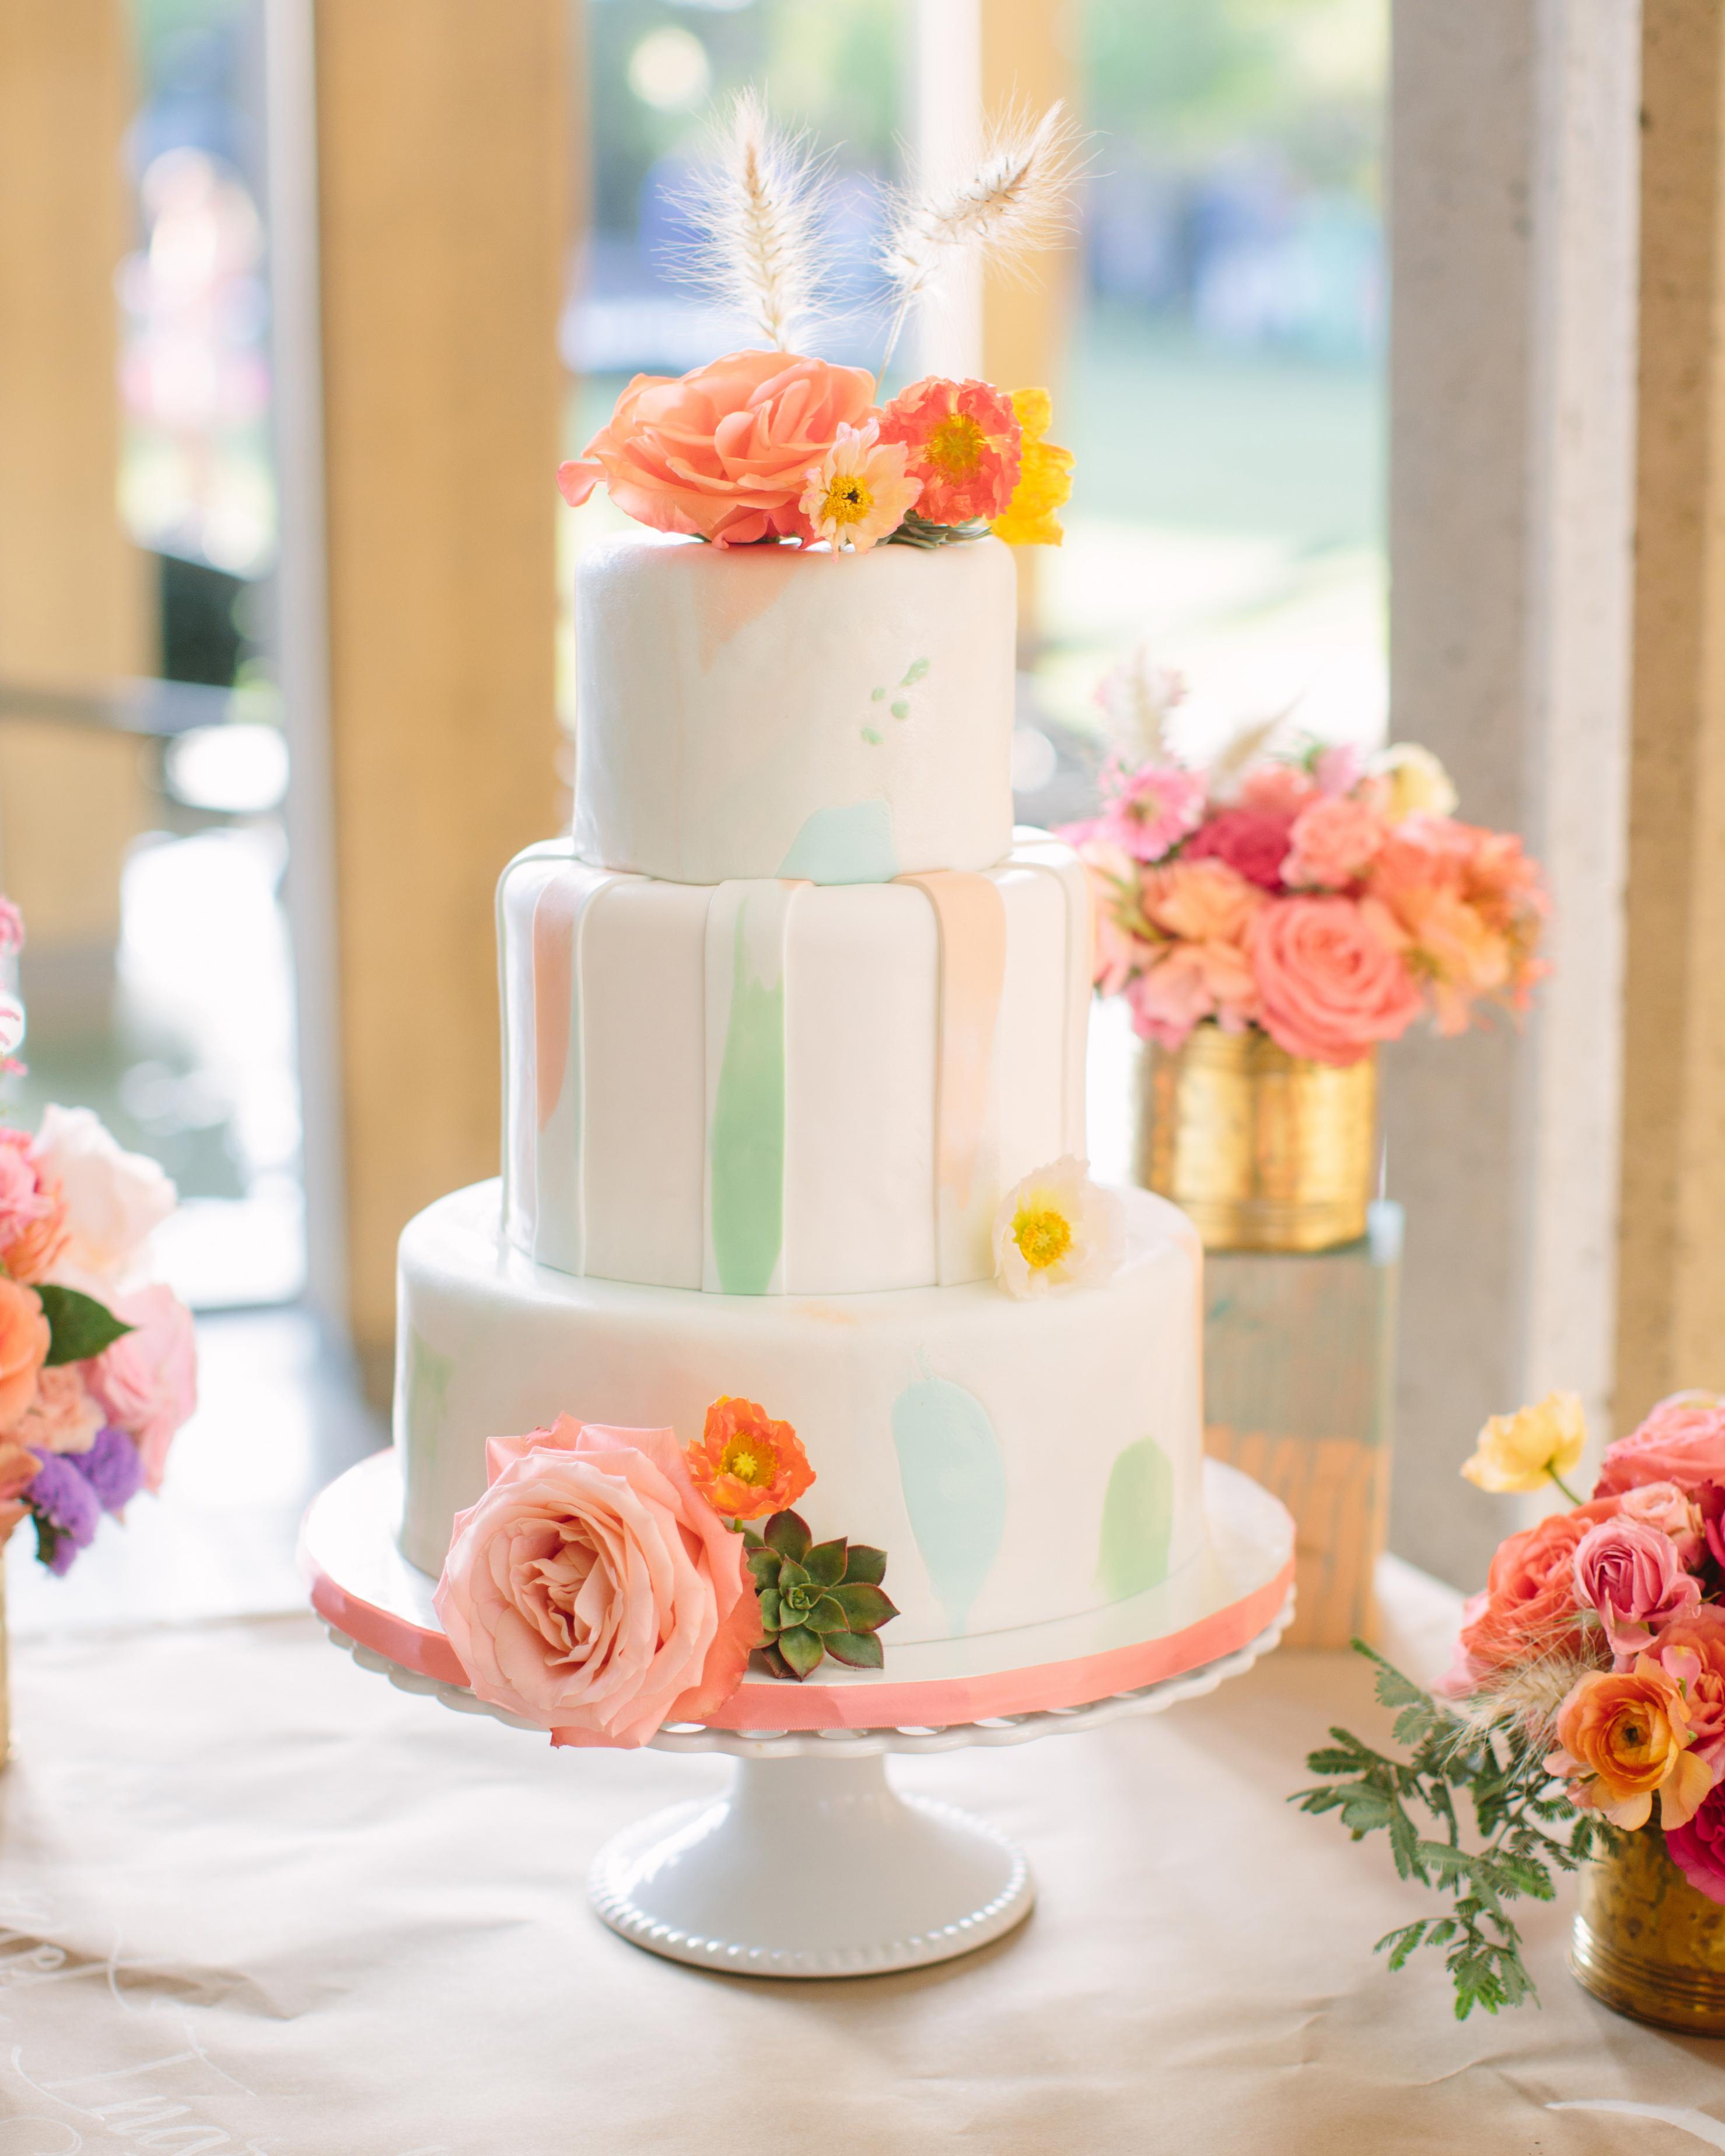 gina-craig-wedding-cake-0514.jpg